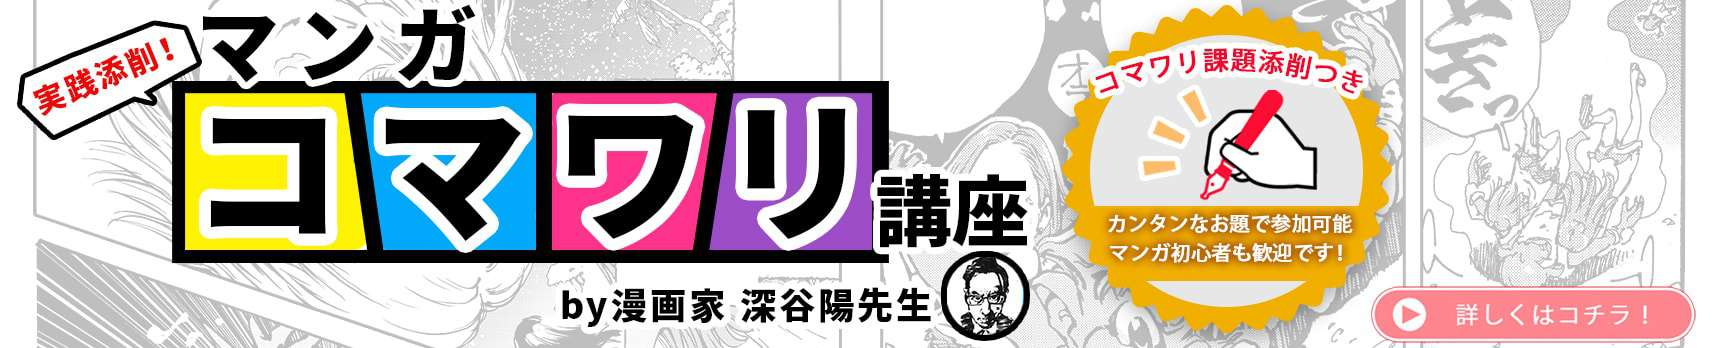 Fukaya banner pc